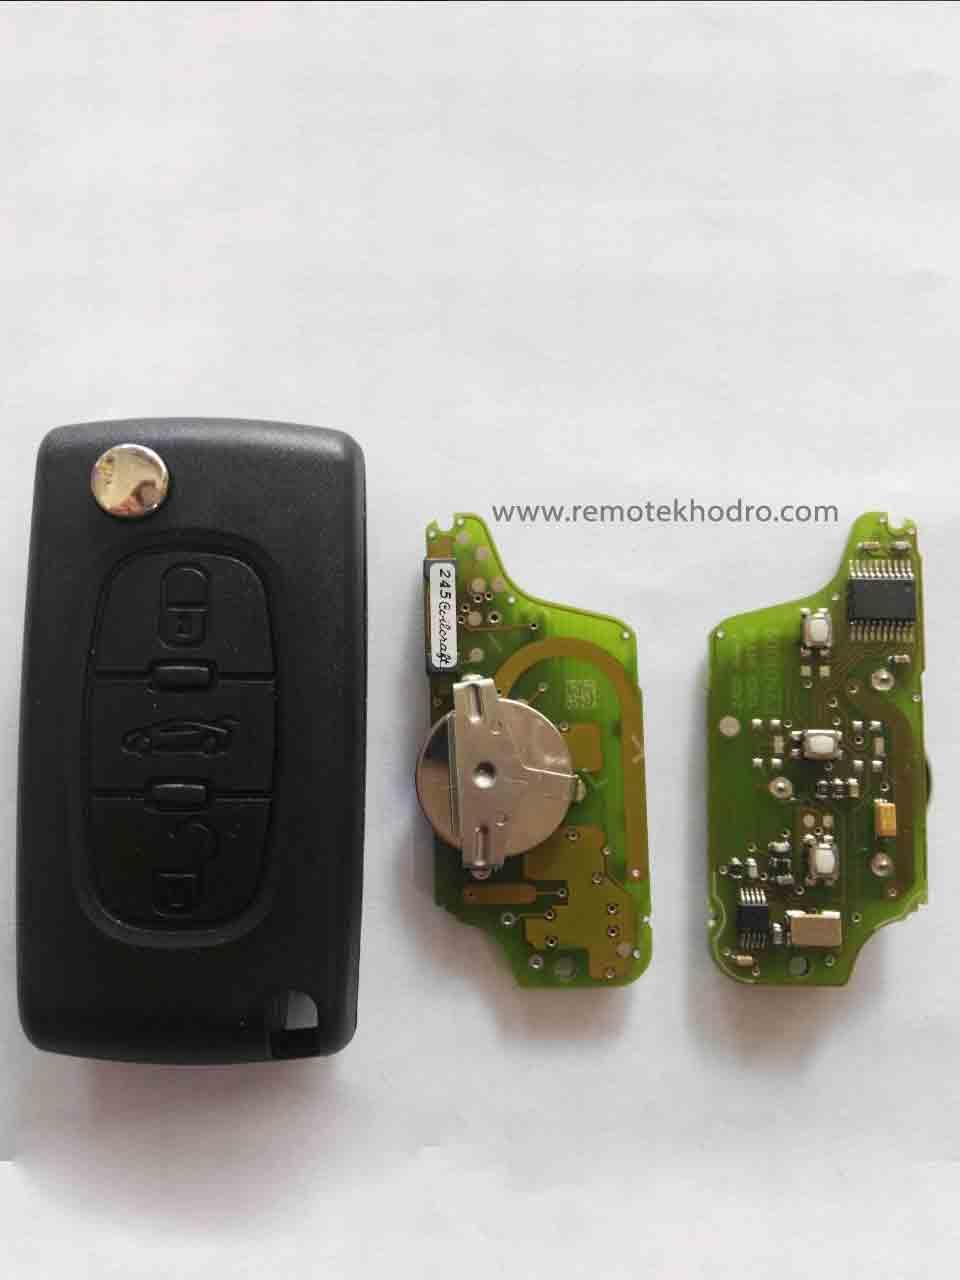 تعمیر سوئیچ و ریموت خودرو پژو ، کددهی، پروگرام، کپی کلید یدک پژو